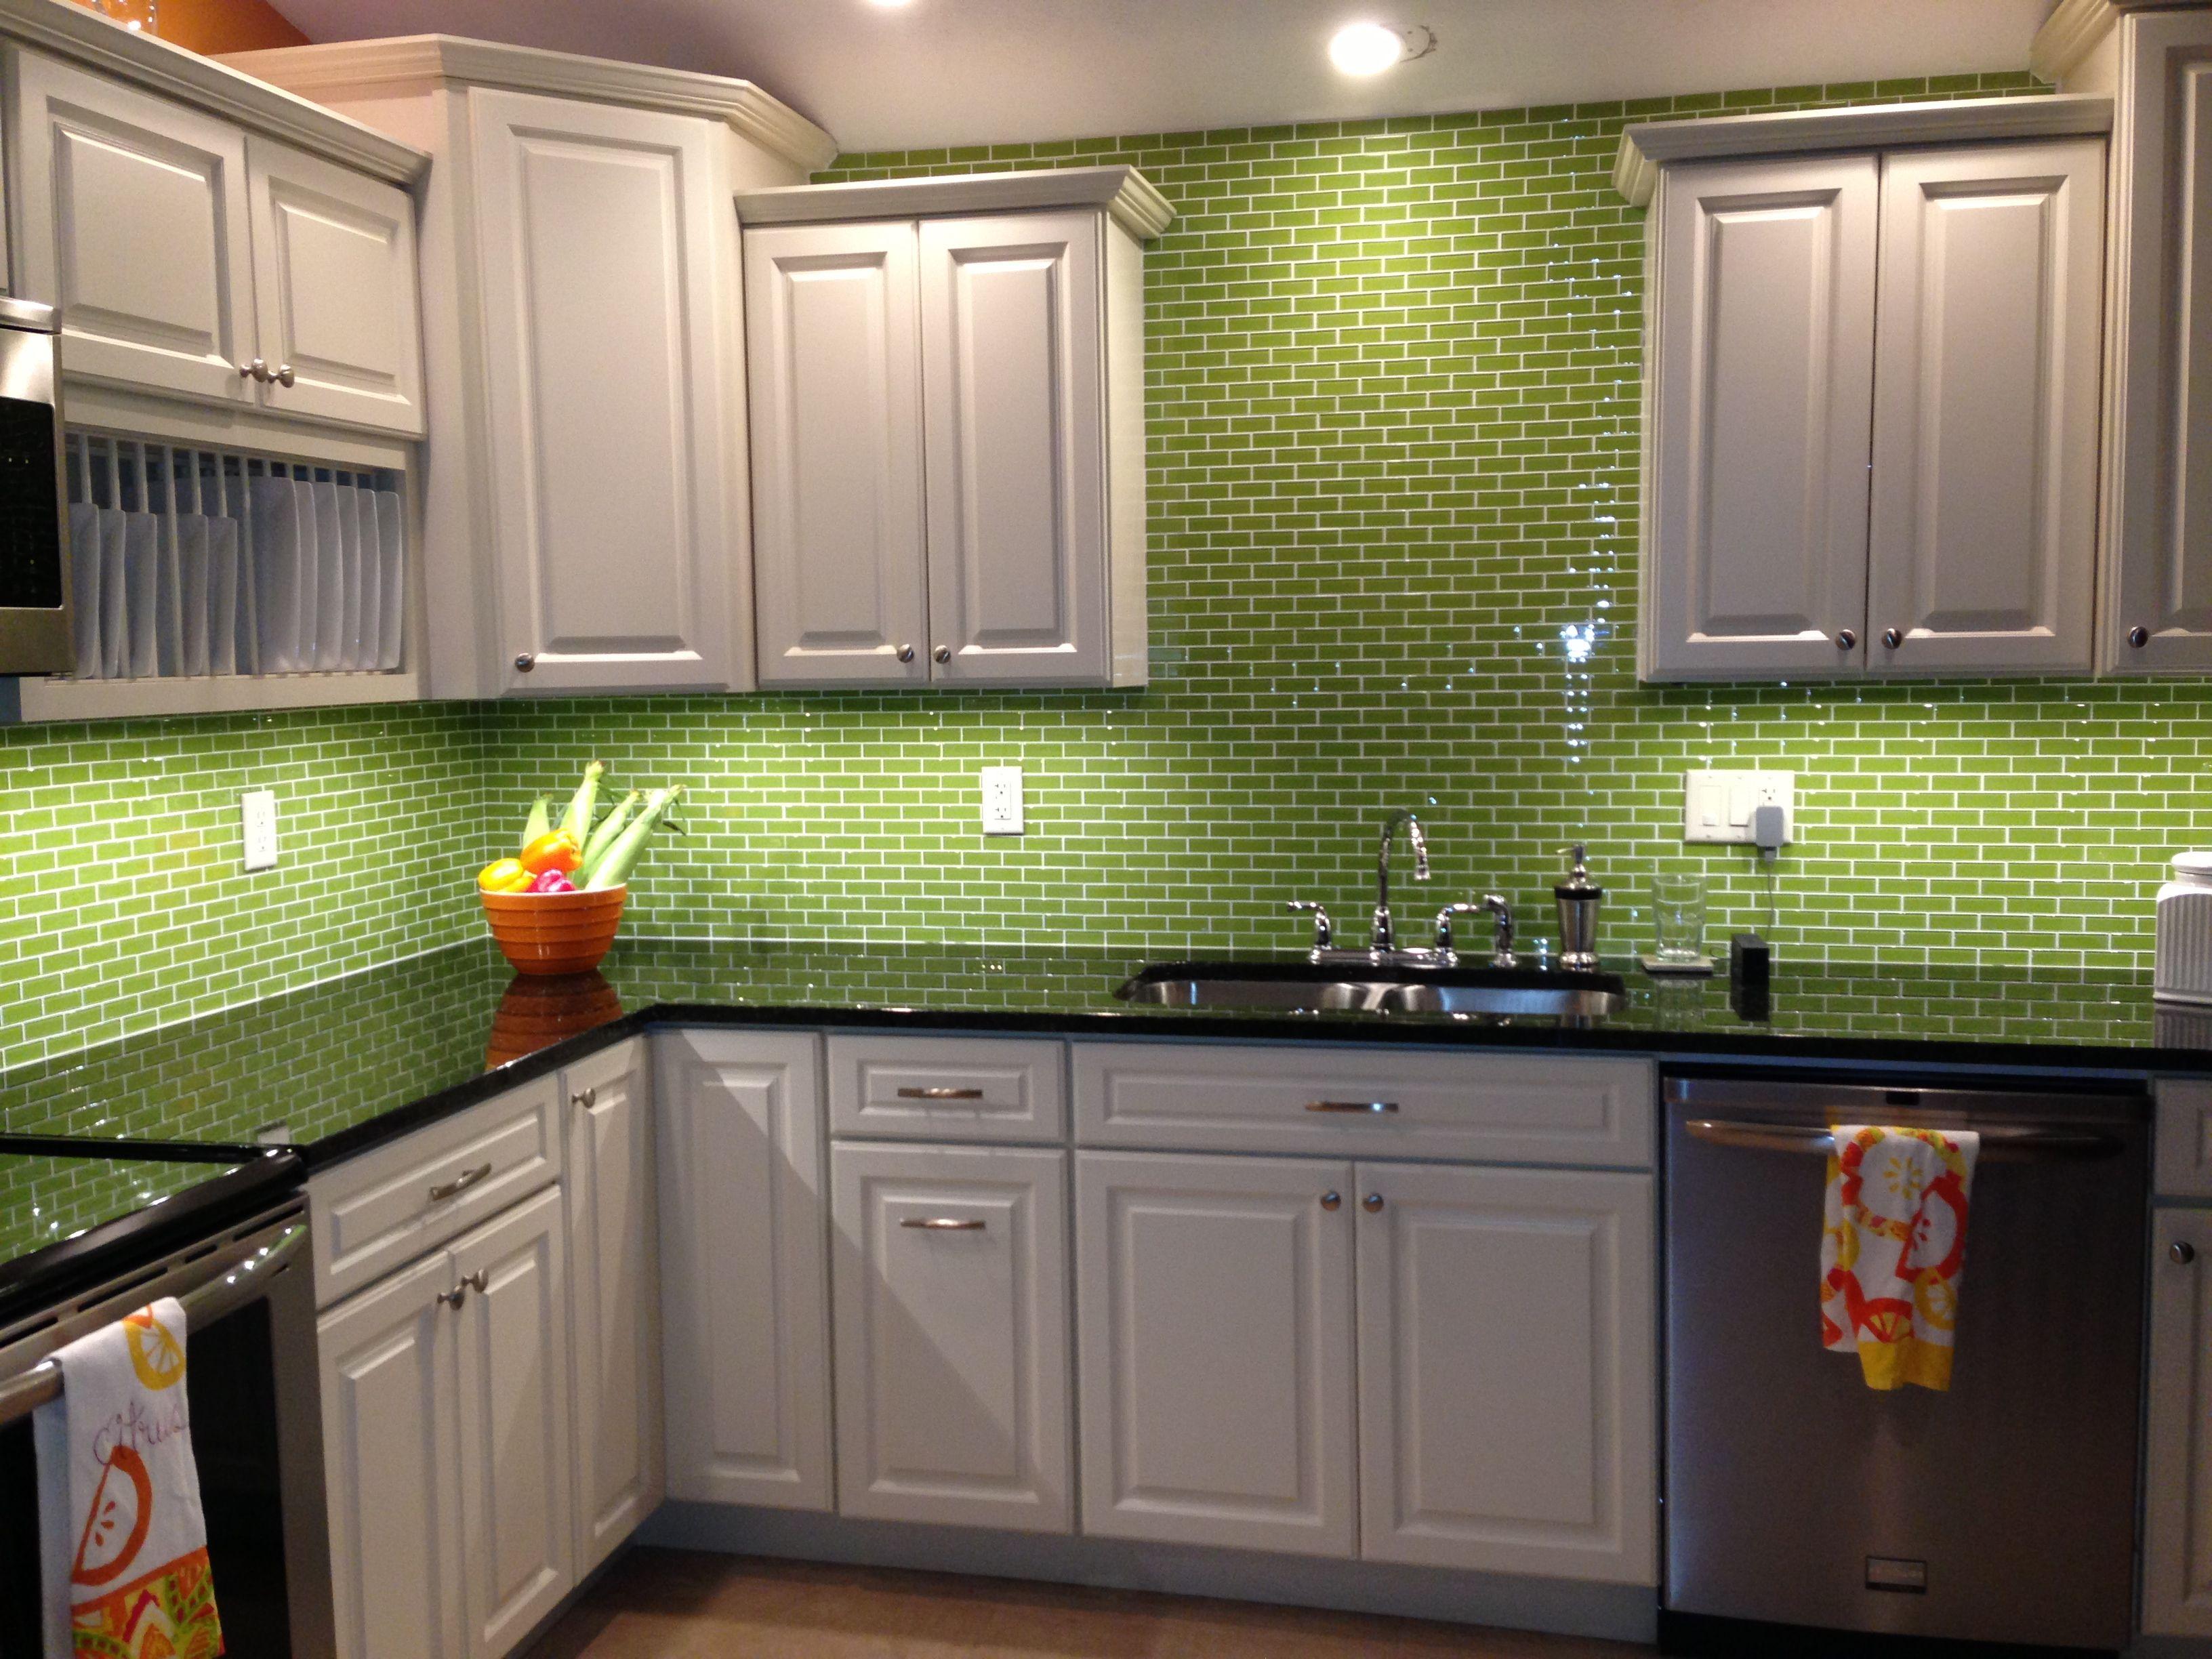 Lime green glass subway tile backsplash kitchen